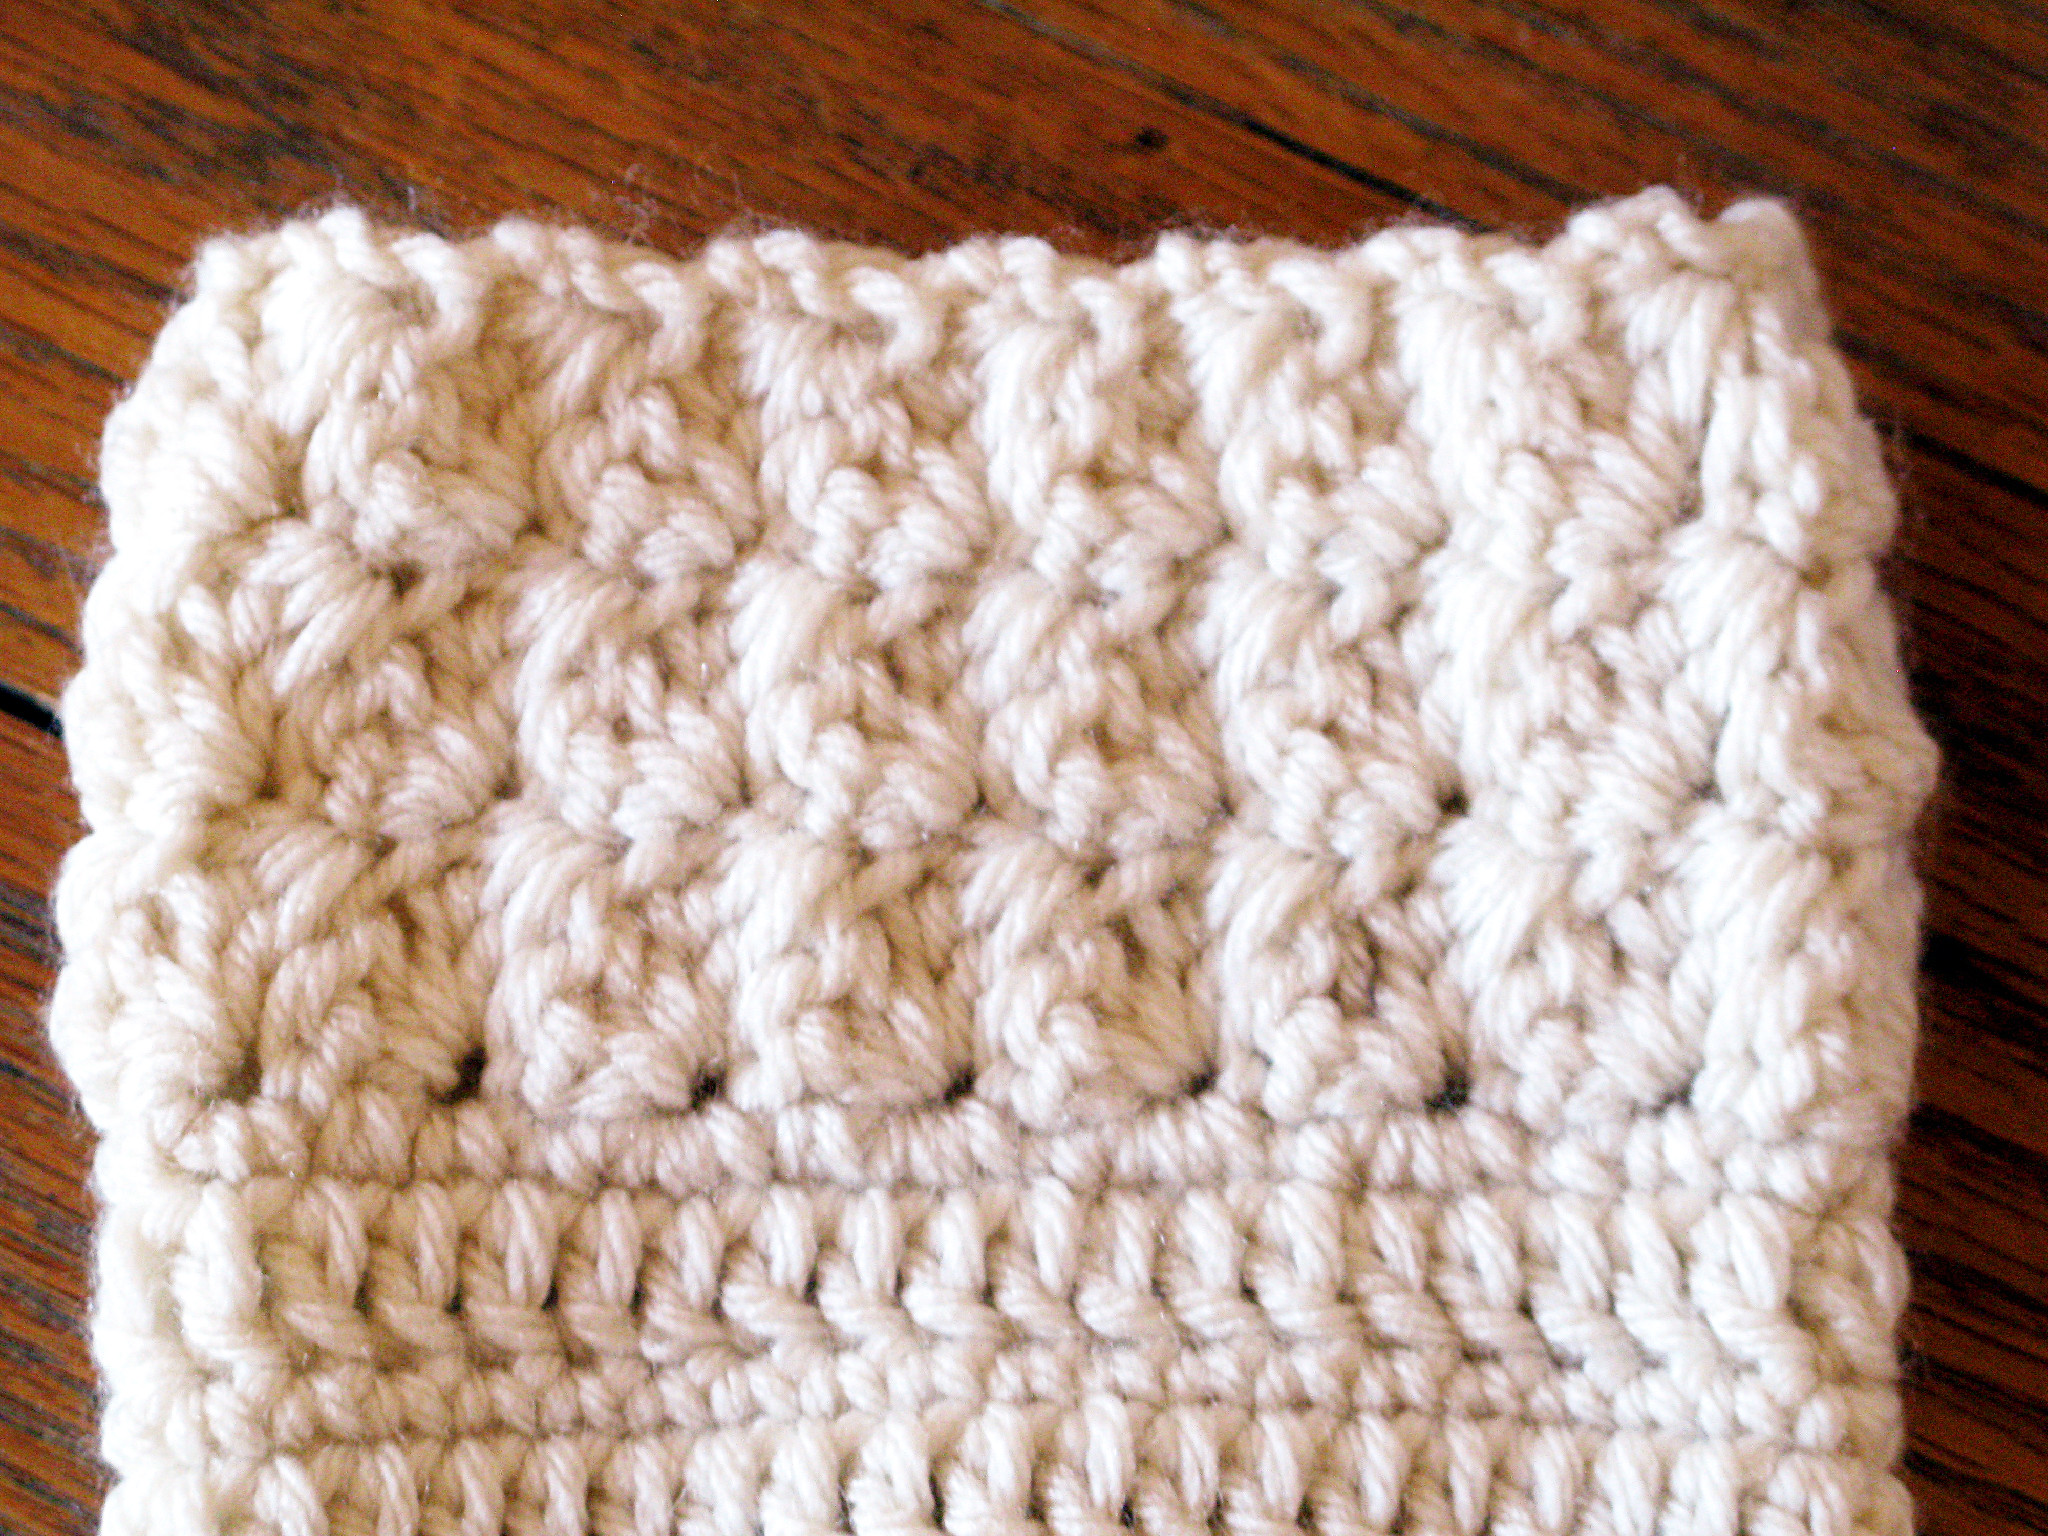 Free Crochet Pattern Of Boot Cuffs : I Had No Idea Boot Cuffs Were So Popular! Ripple Stitch ...